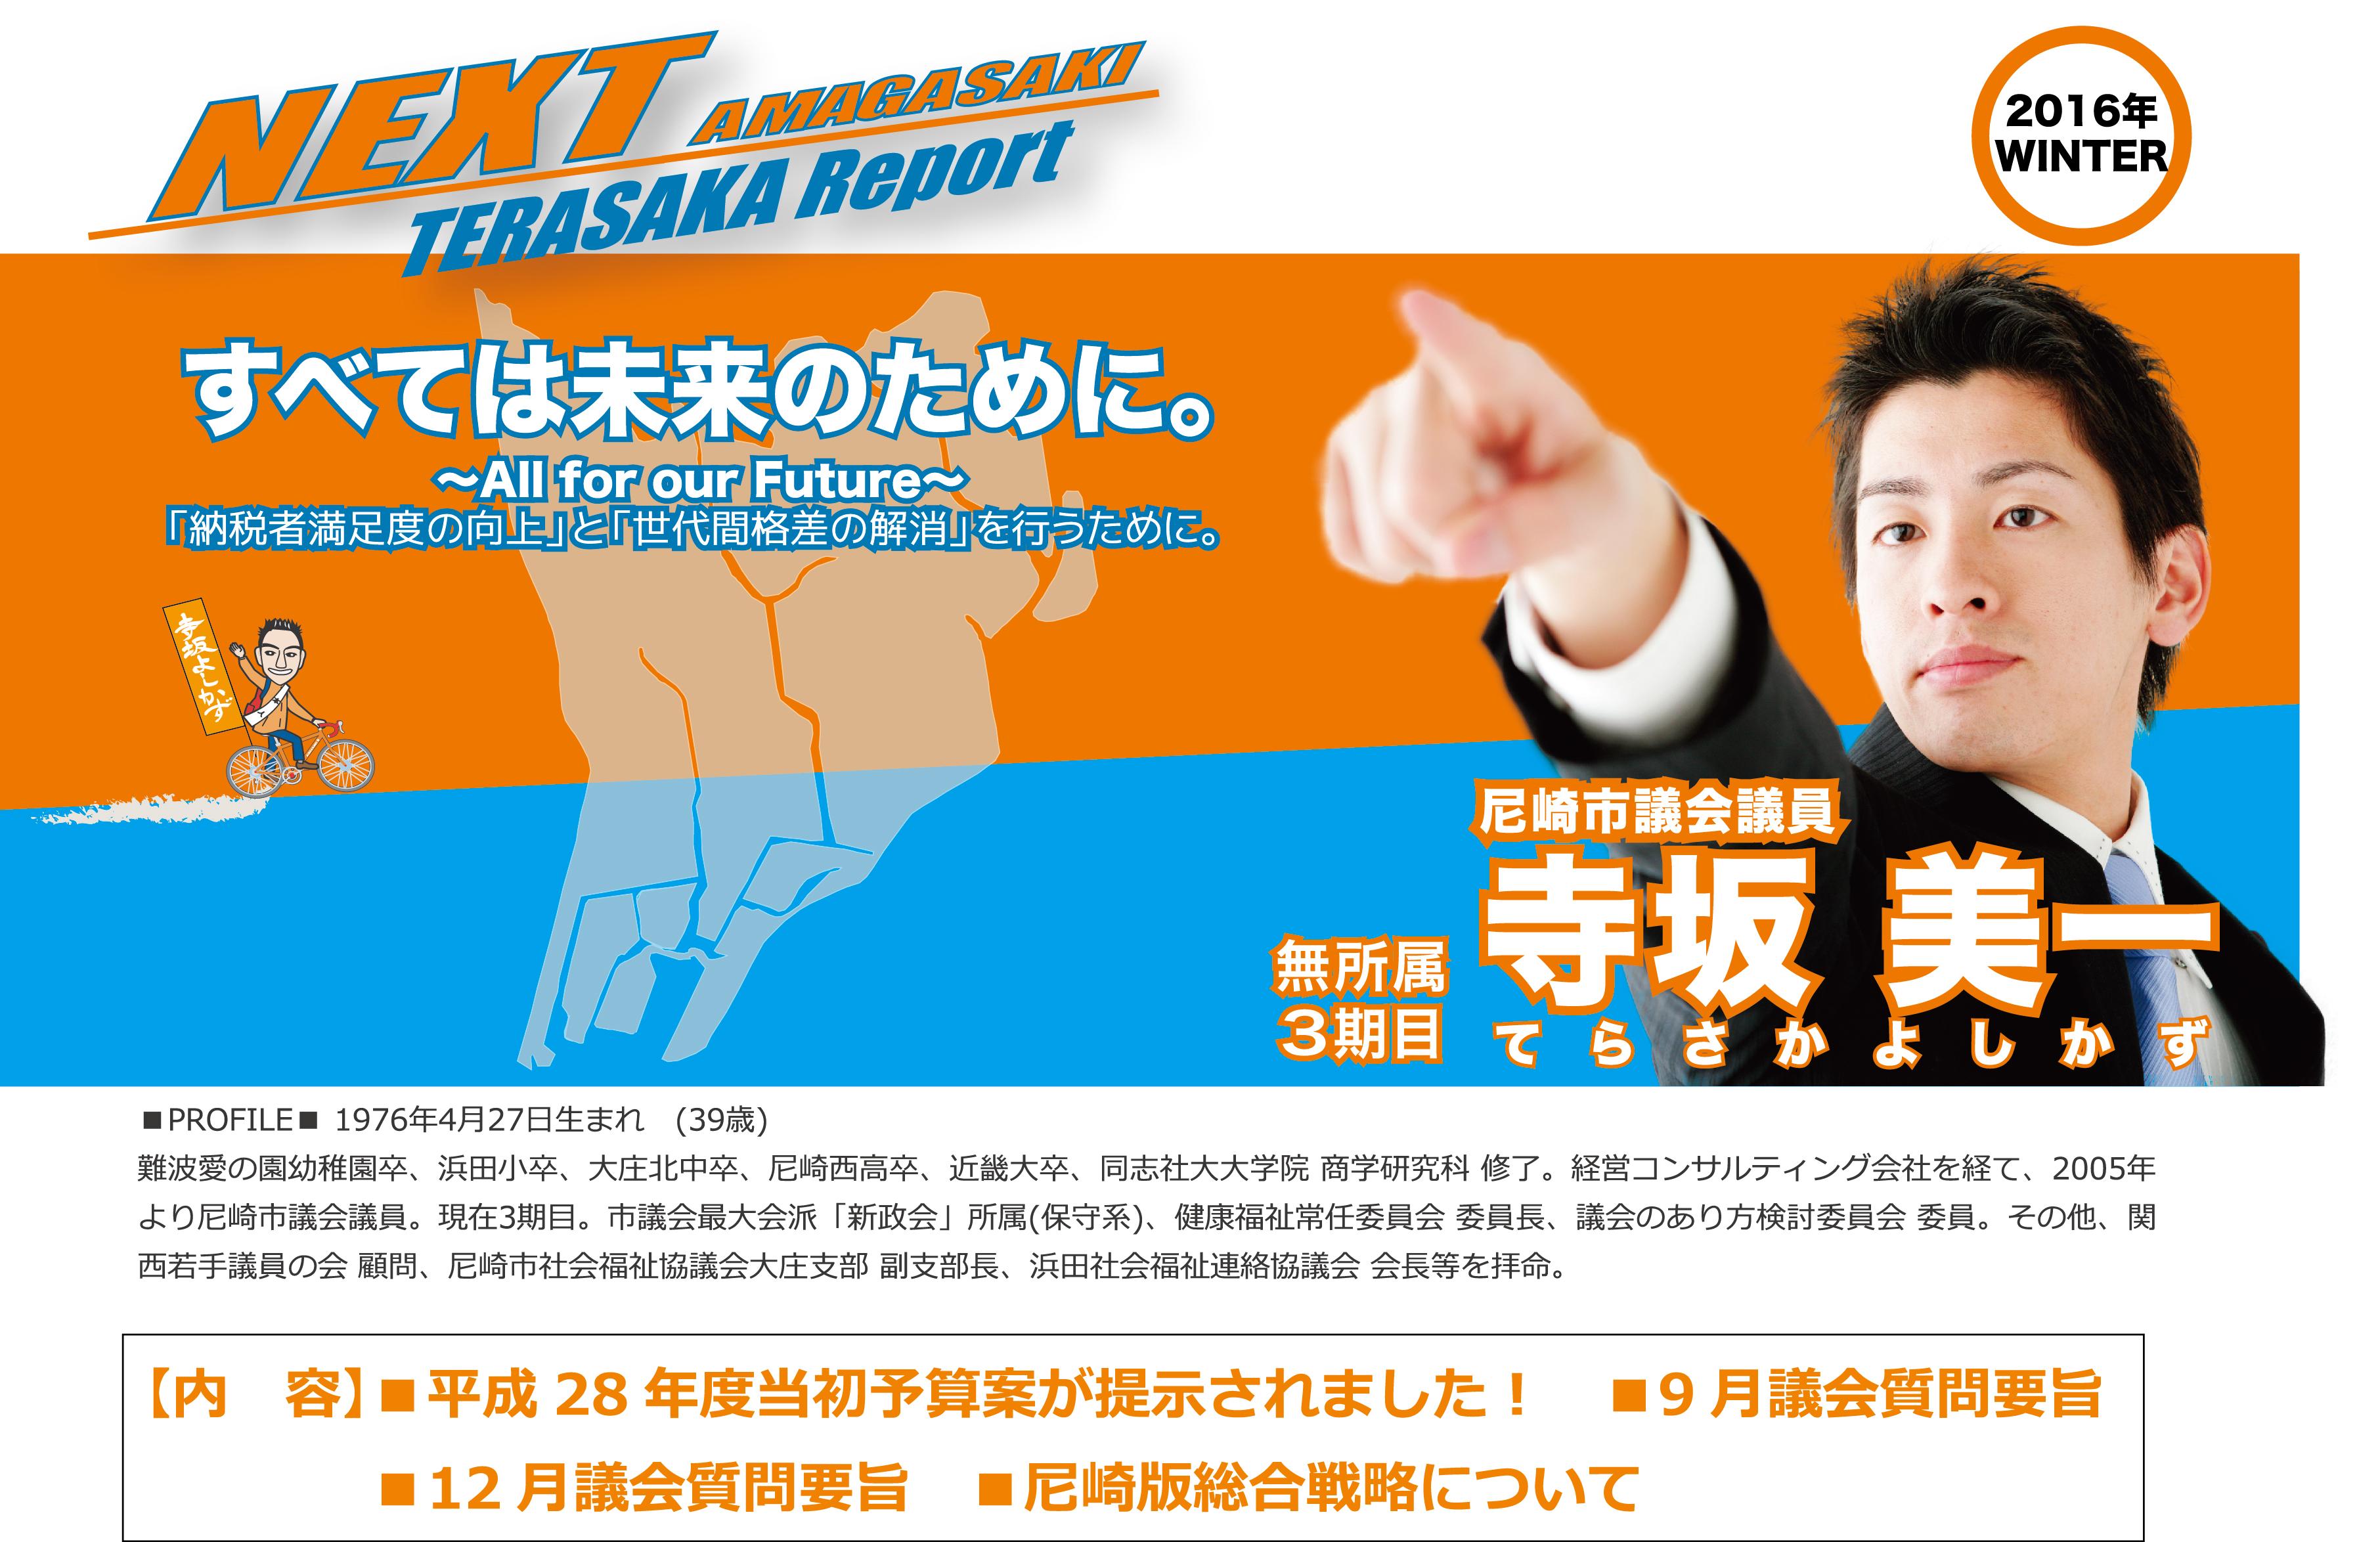 TERASAKA Report 2016 WINTER